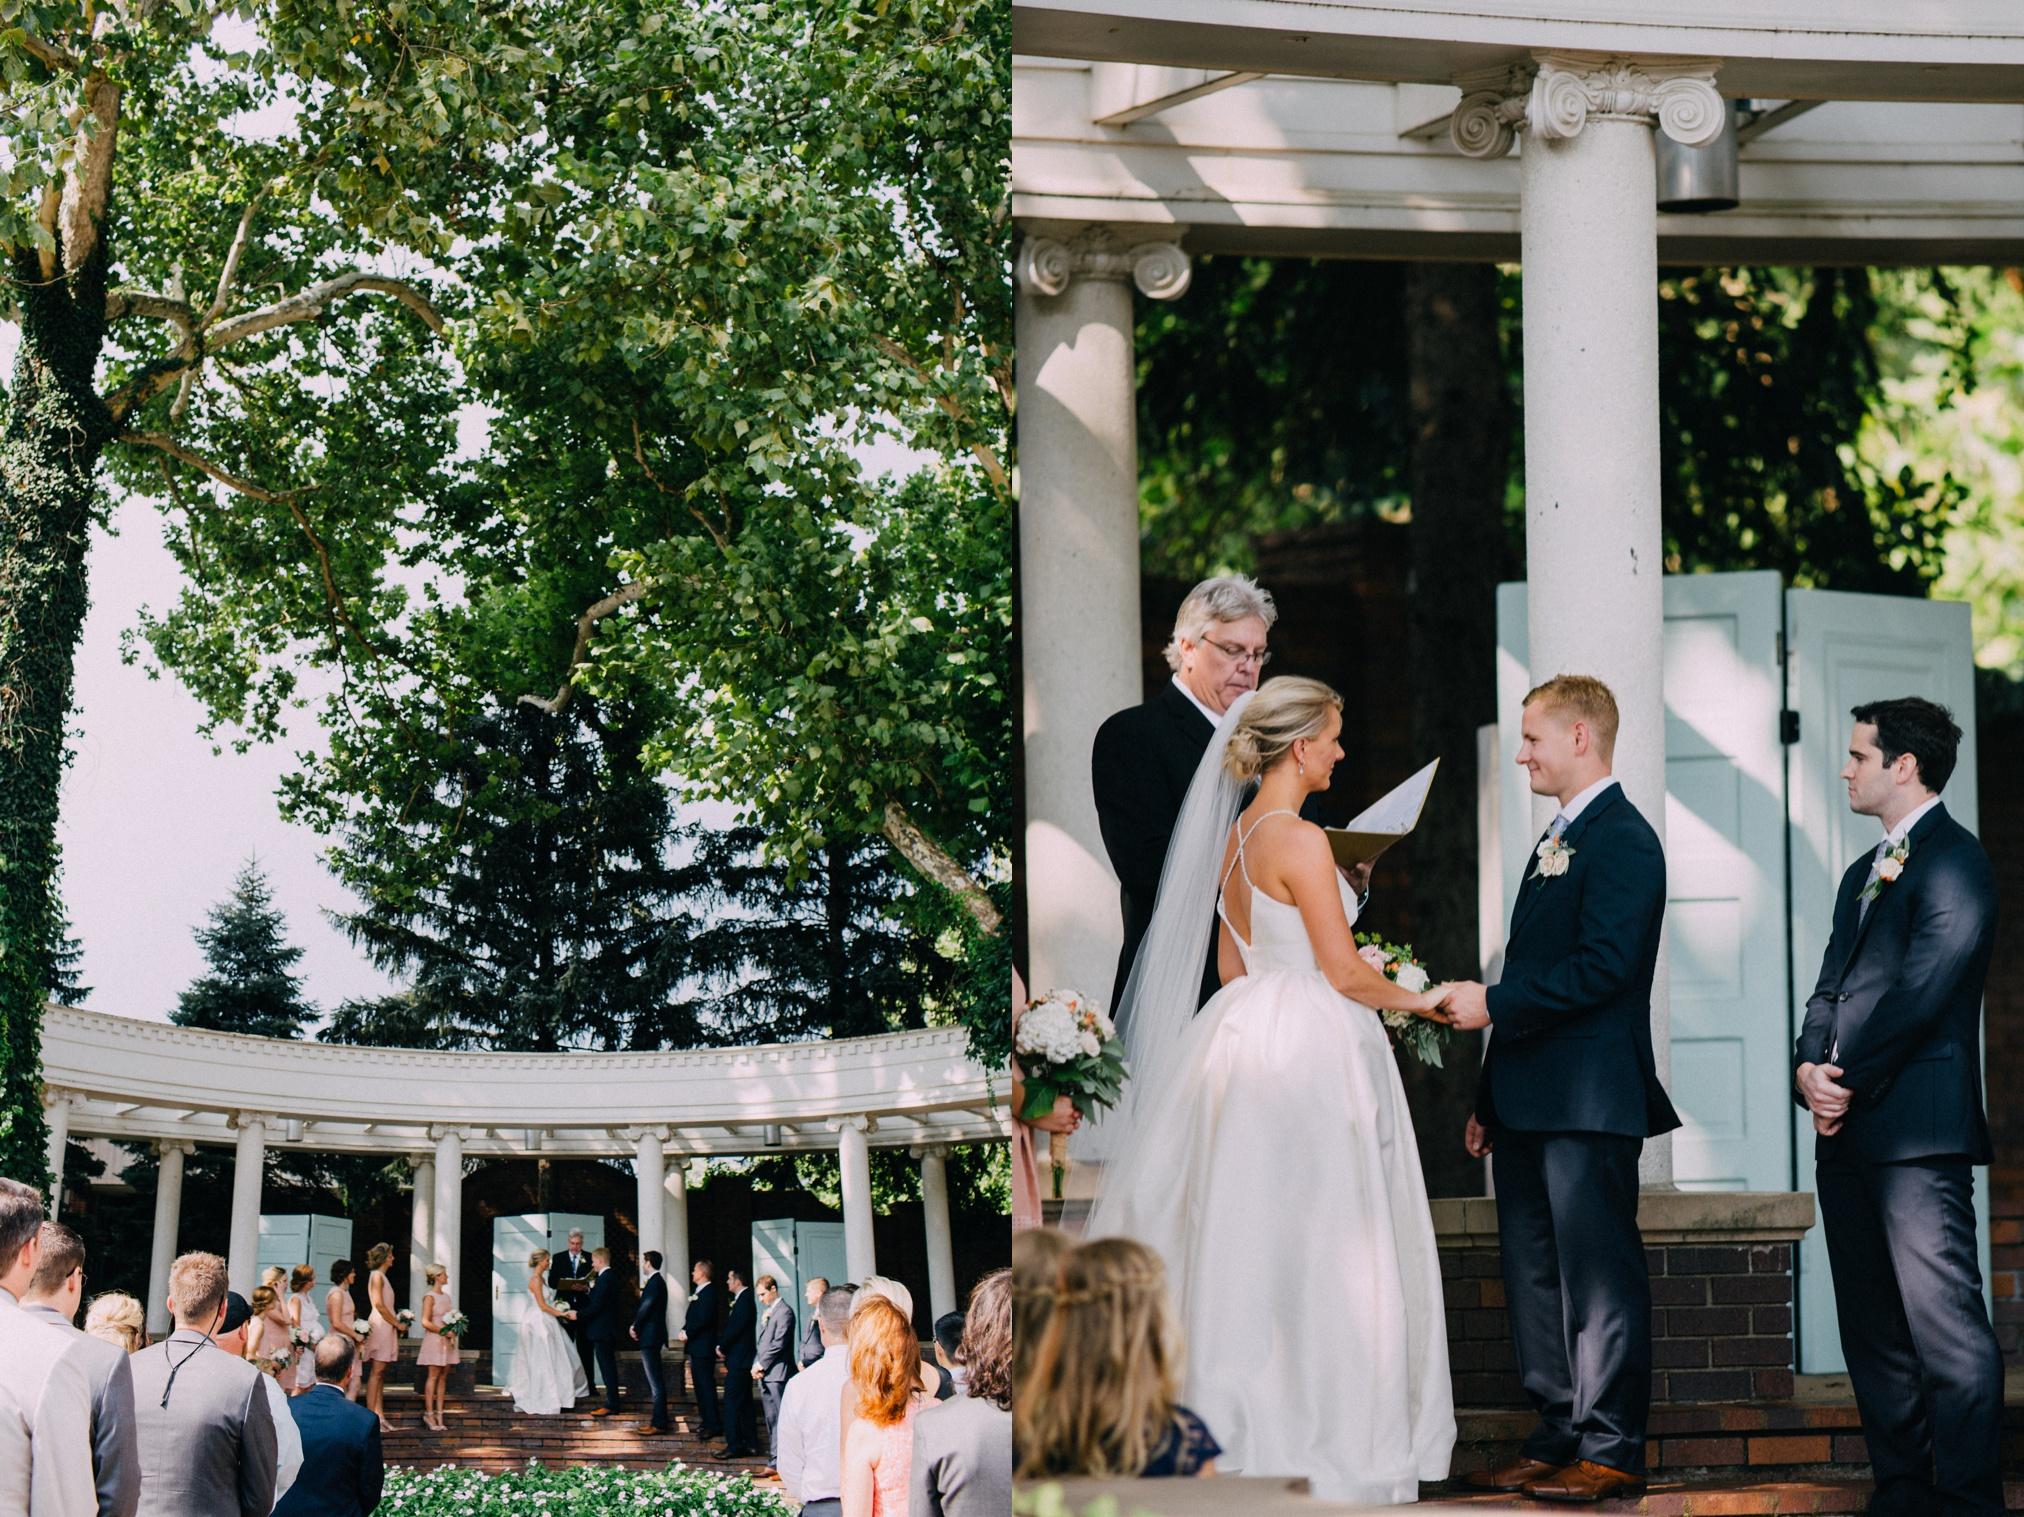 brenna+michael_wedding-408.jpg